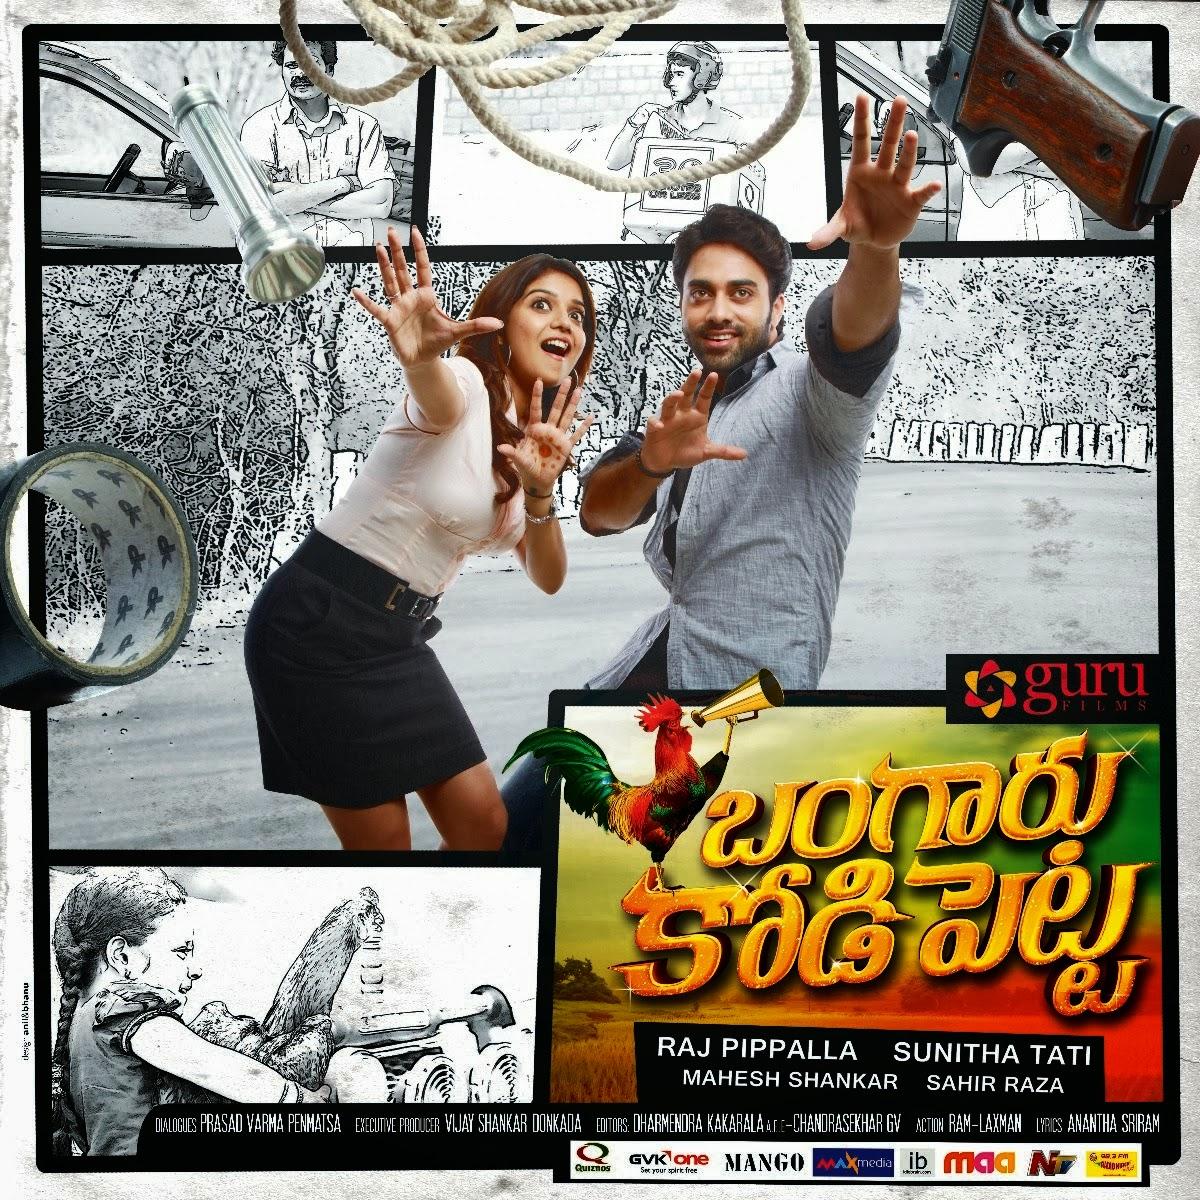 Bangaru+Kodipetta+Movie+Review+Rating+Telugu+Survi.jpg